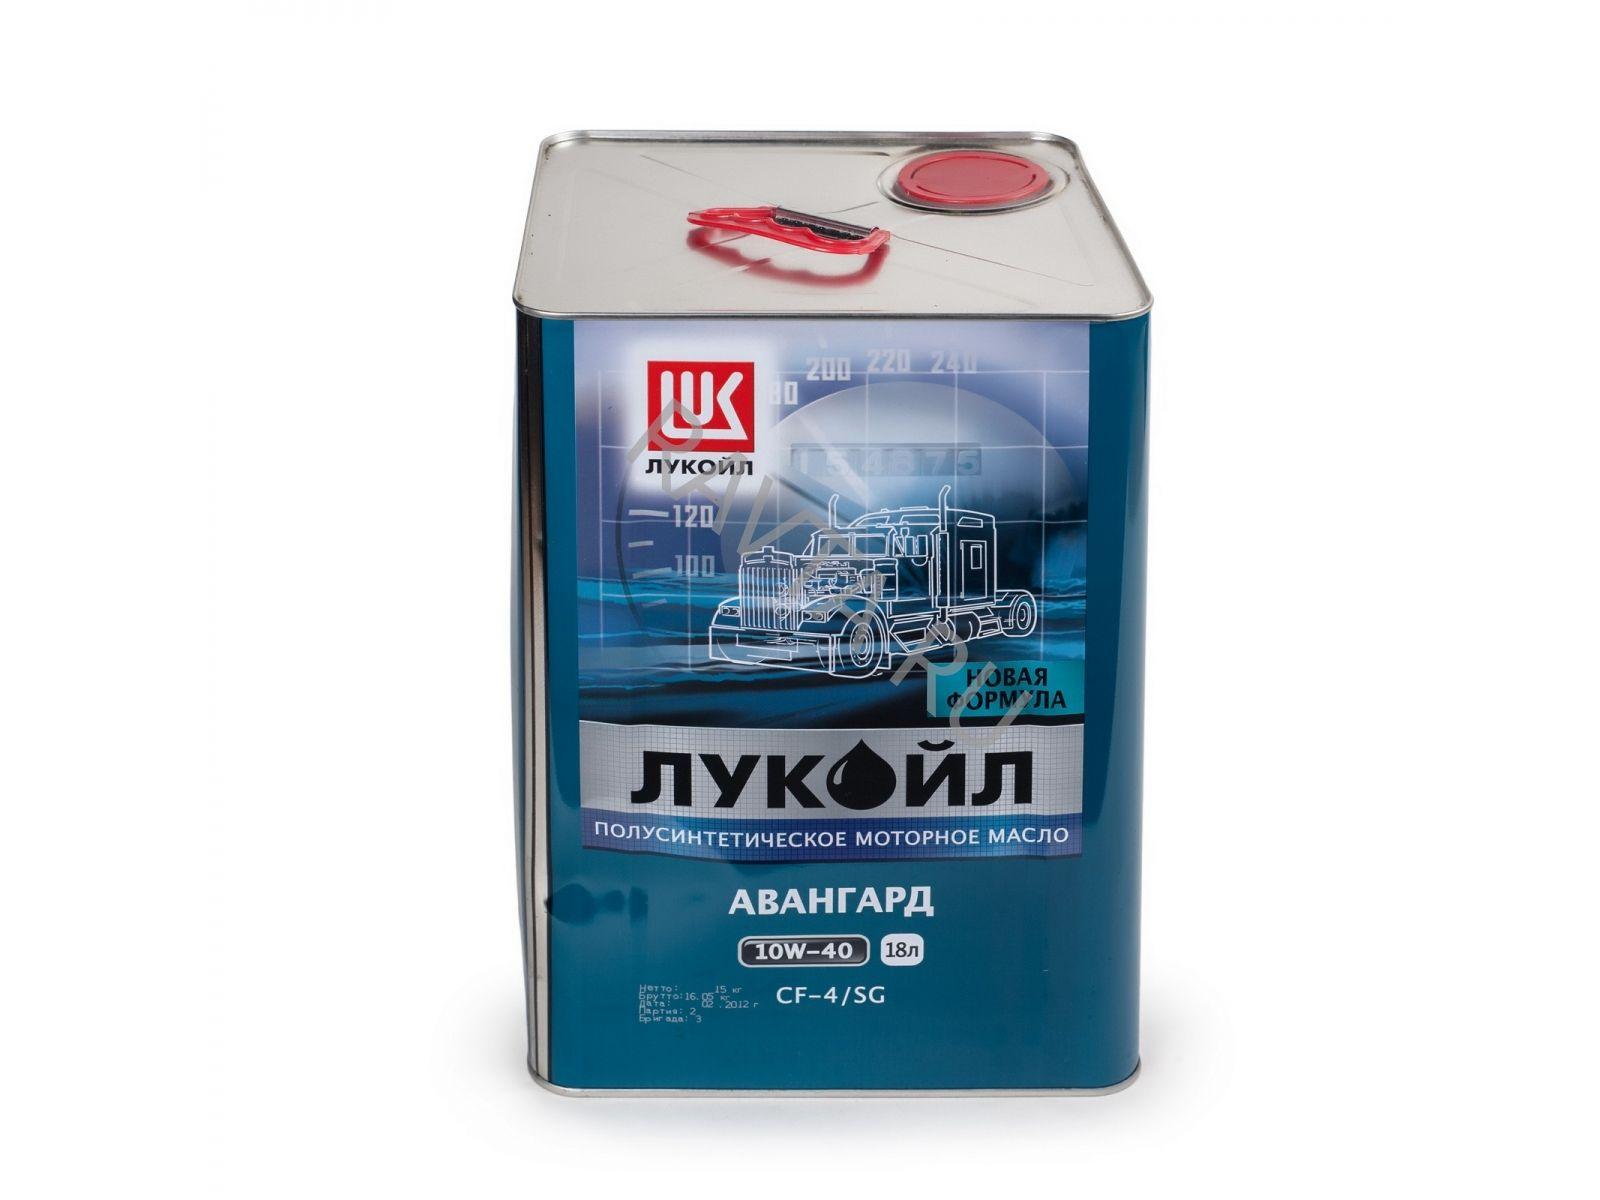 Масло Лукойл АВАНГАРД 10W 40 (18л) от Ravta